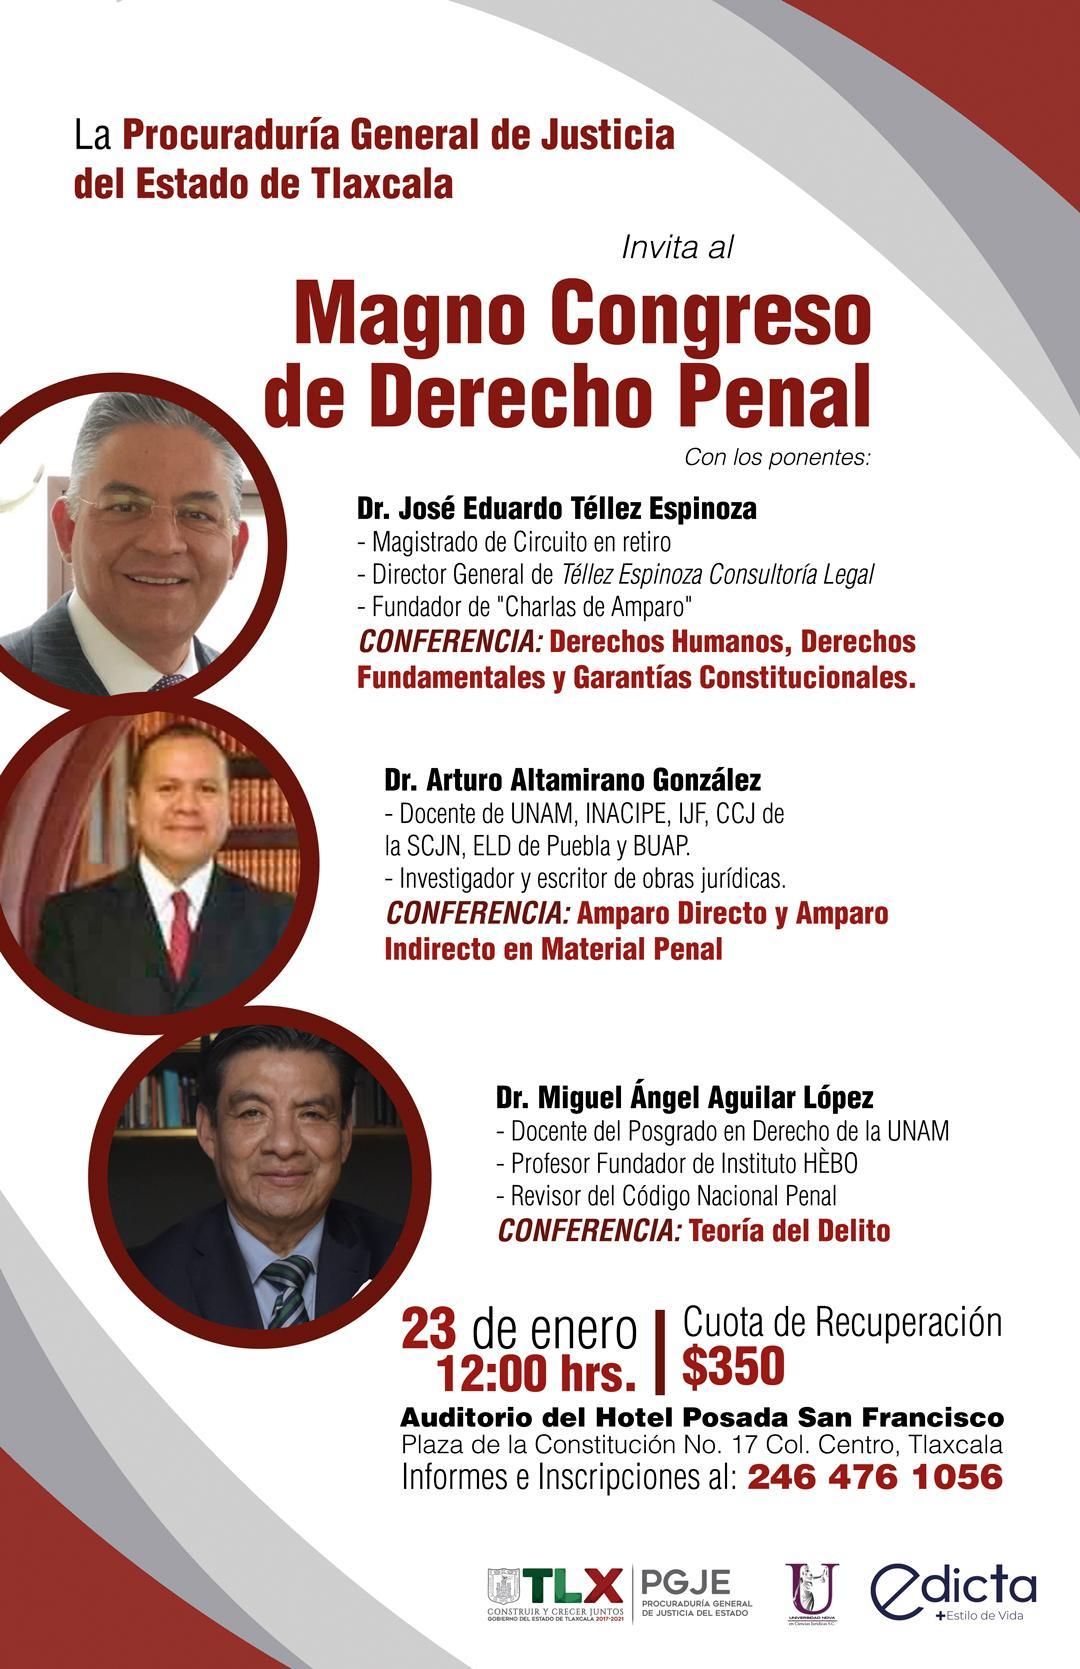 INVITA PGJE A MAGNO CONGRESO DE DERECHO PENAL